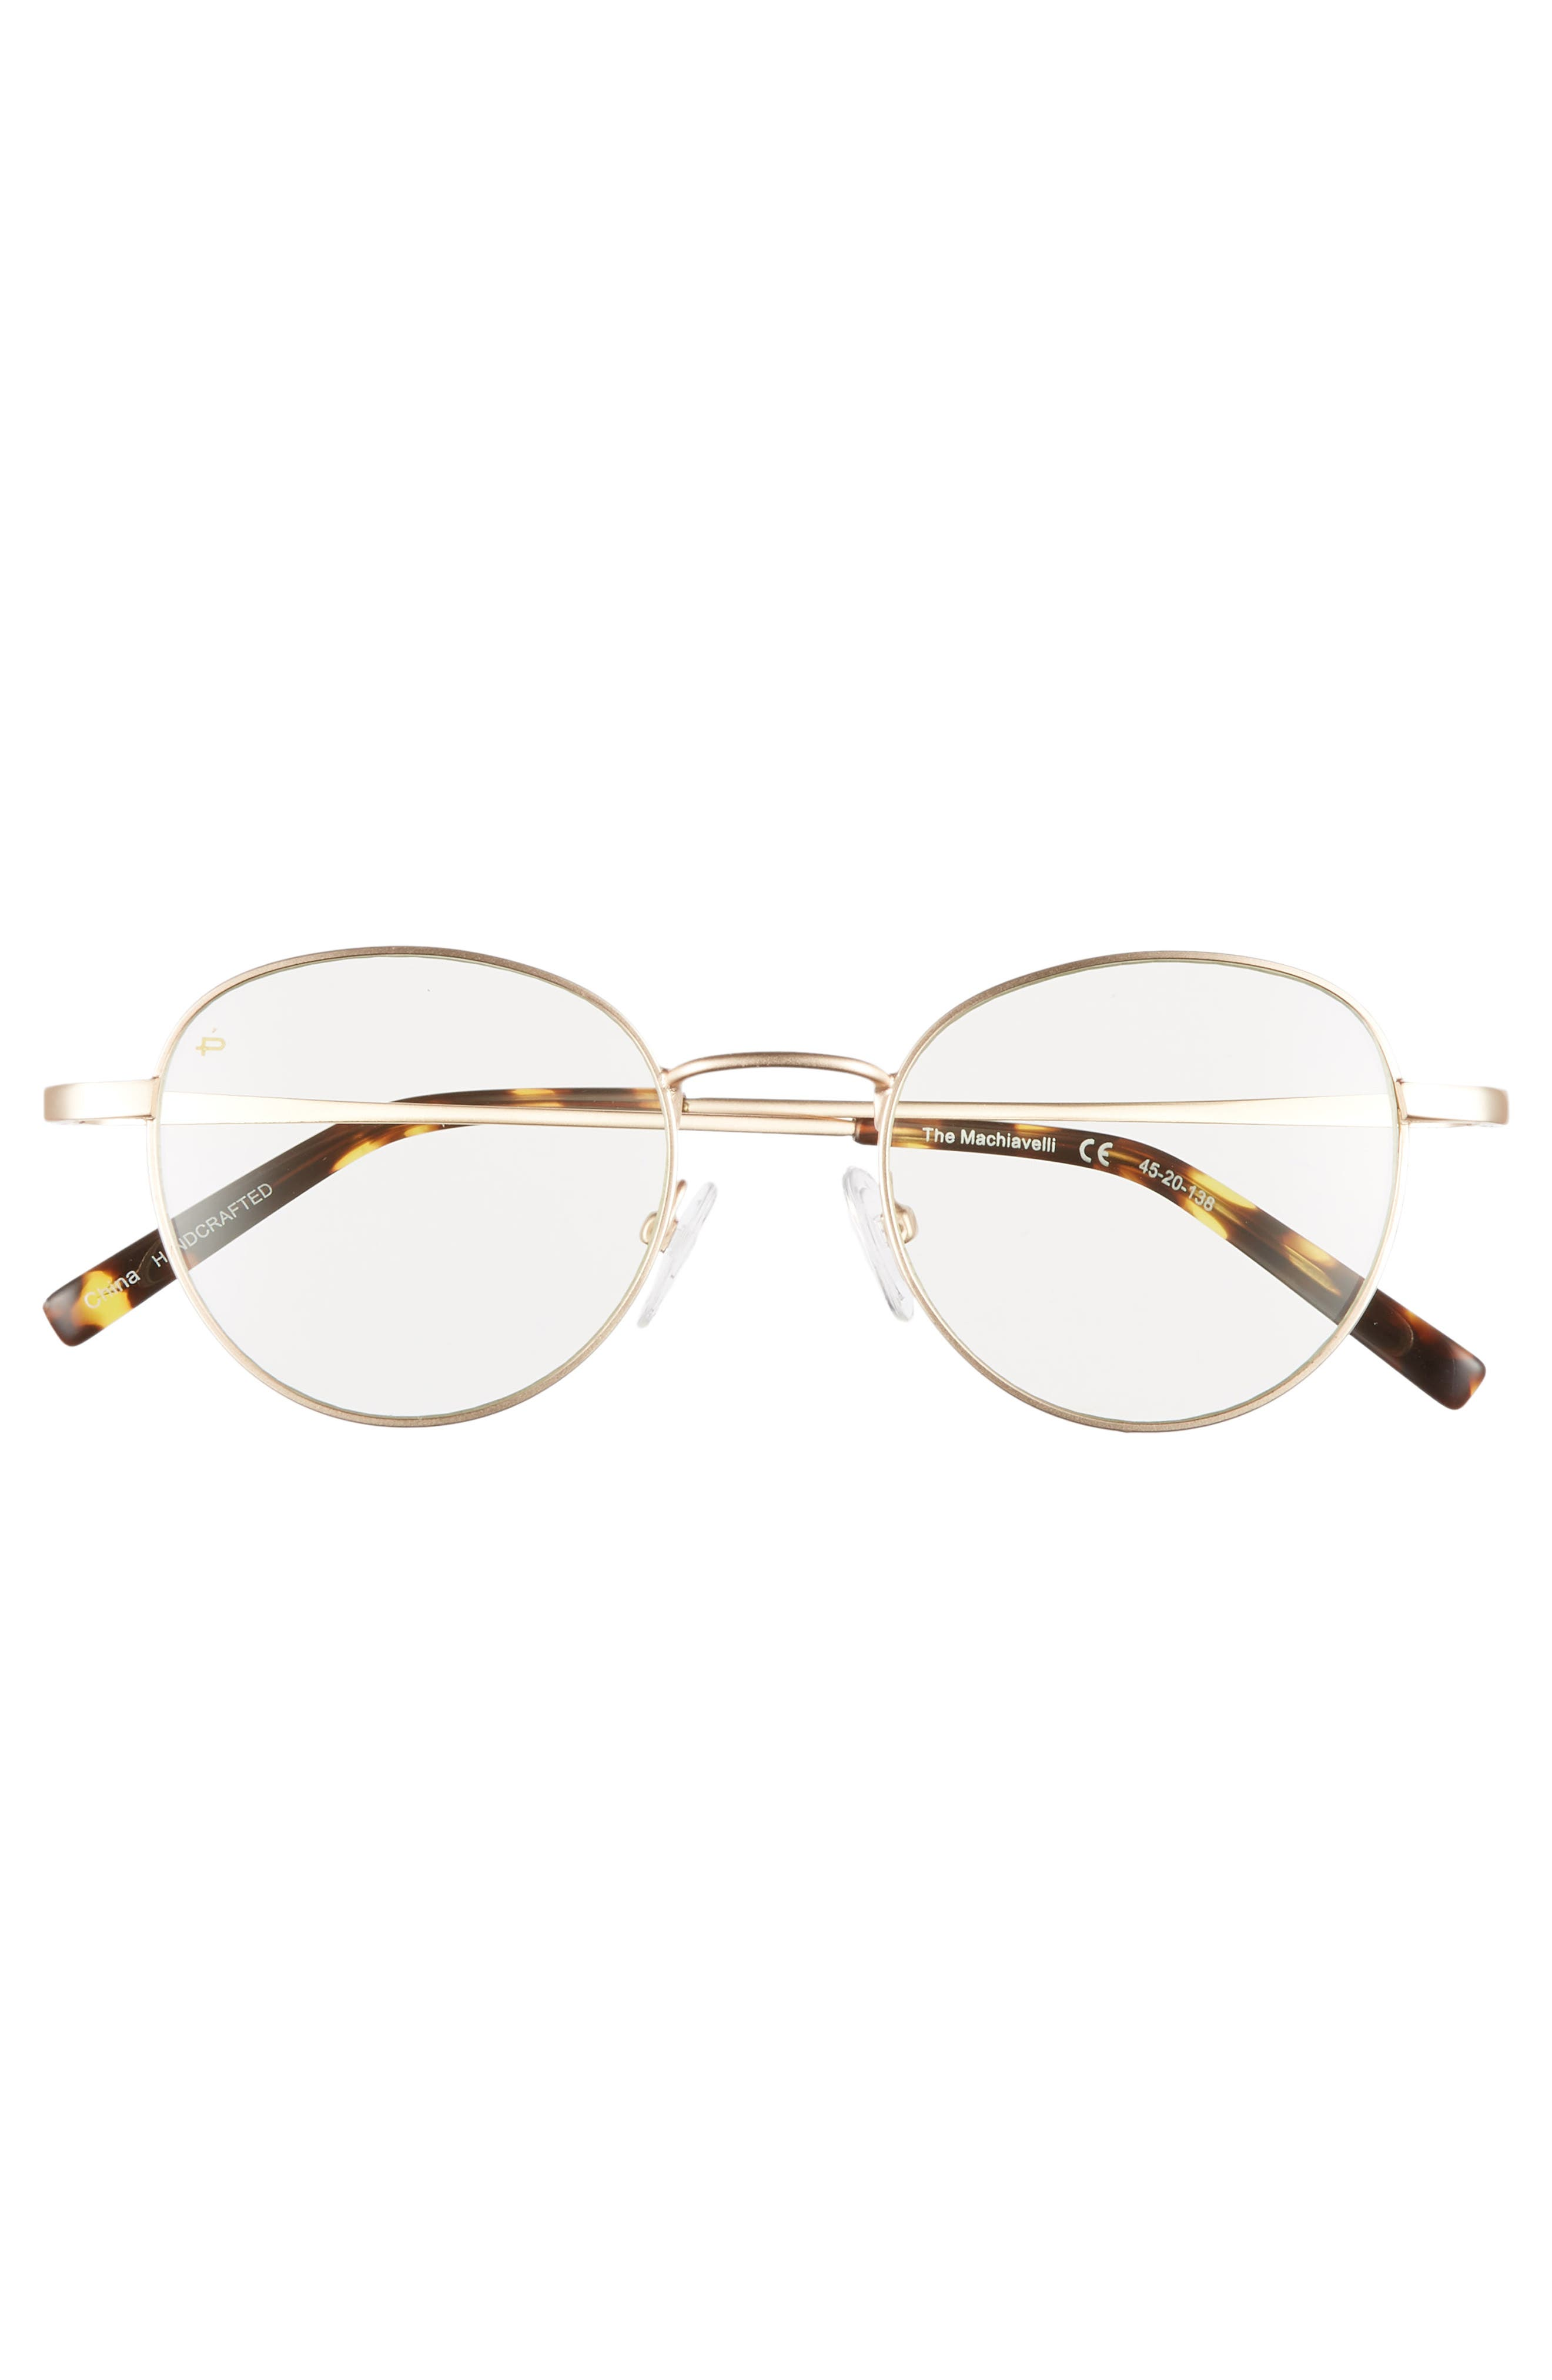 Privé Revaux The Machiavelli 45mm Blue Light Blocking Glasses,                             Alternate thumbnail 6, color,